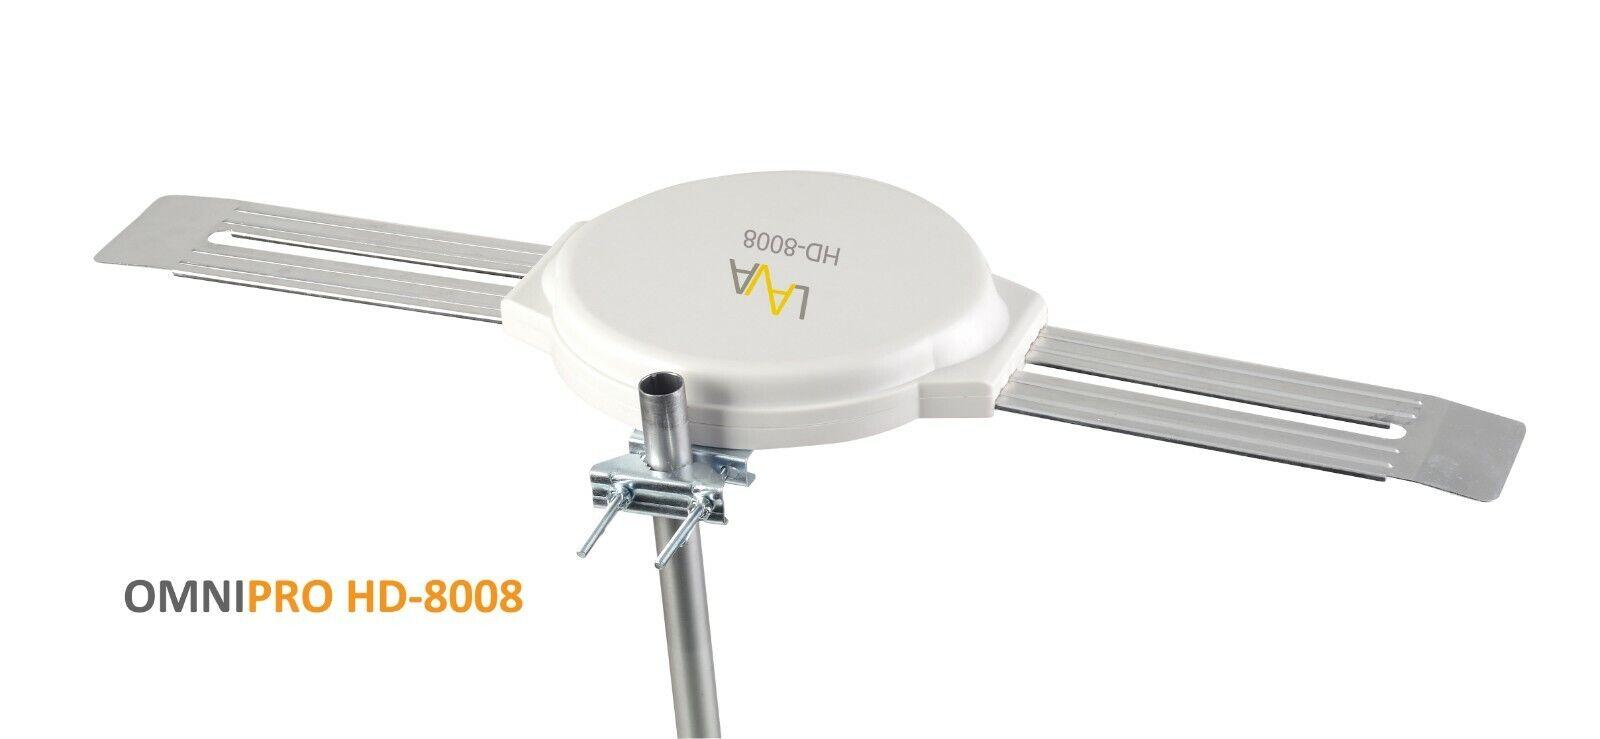 HD-8008 yyelectronicincyy LAVA HD-8008 Outdoor TV Antenna-Omni Directional- UHF/VHF/FM/SDTV/HDTV/4K